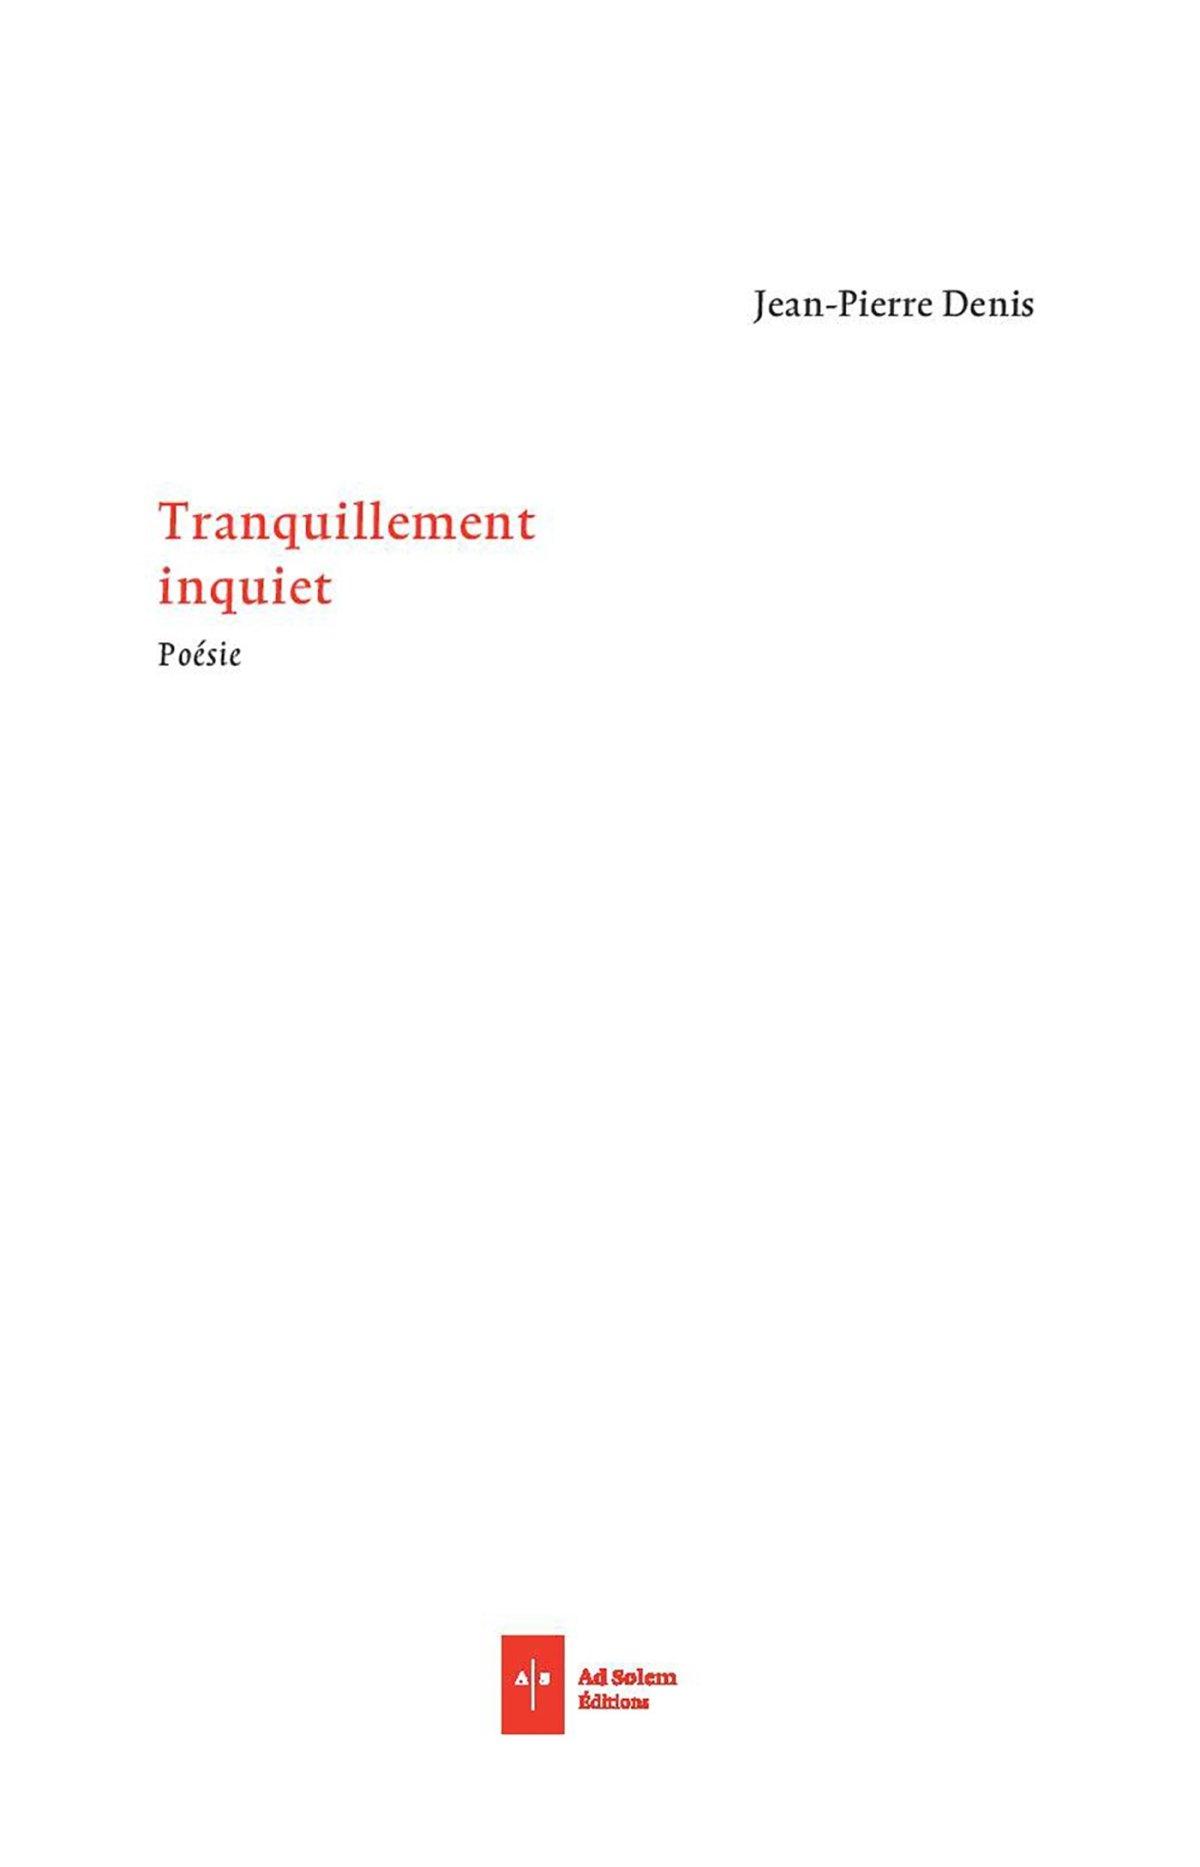 Tranquillement inquiet, Jean-Pierre Denis, Ad Solem, 141 pages, 18 euros.